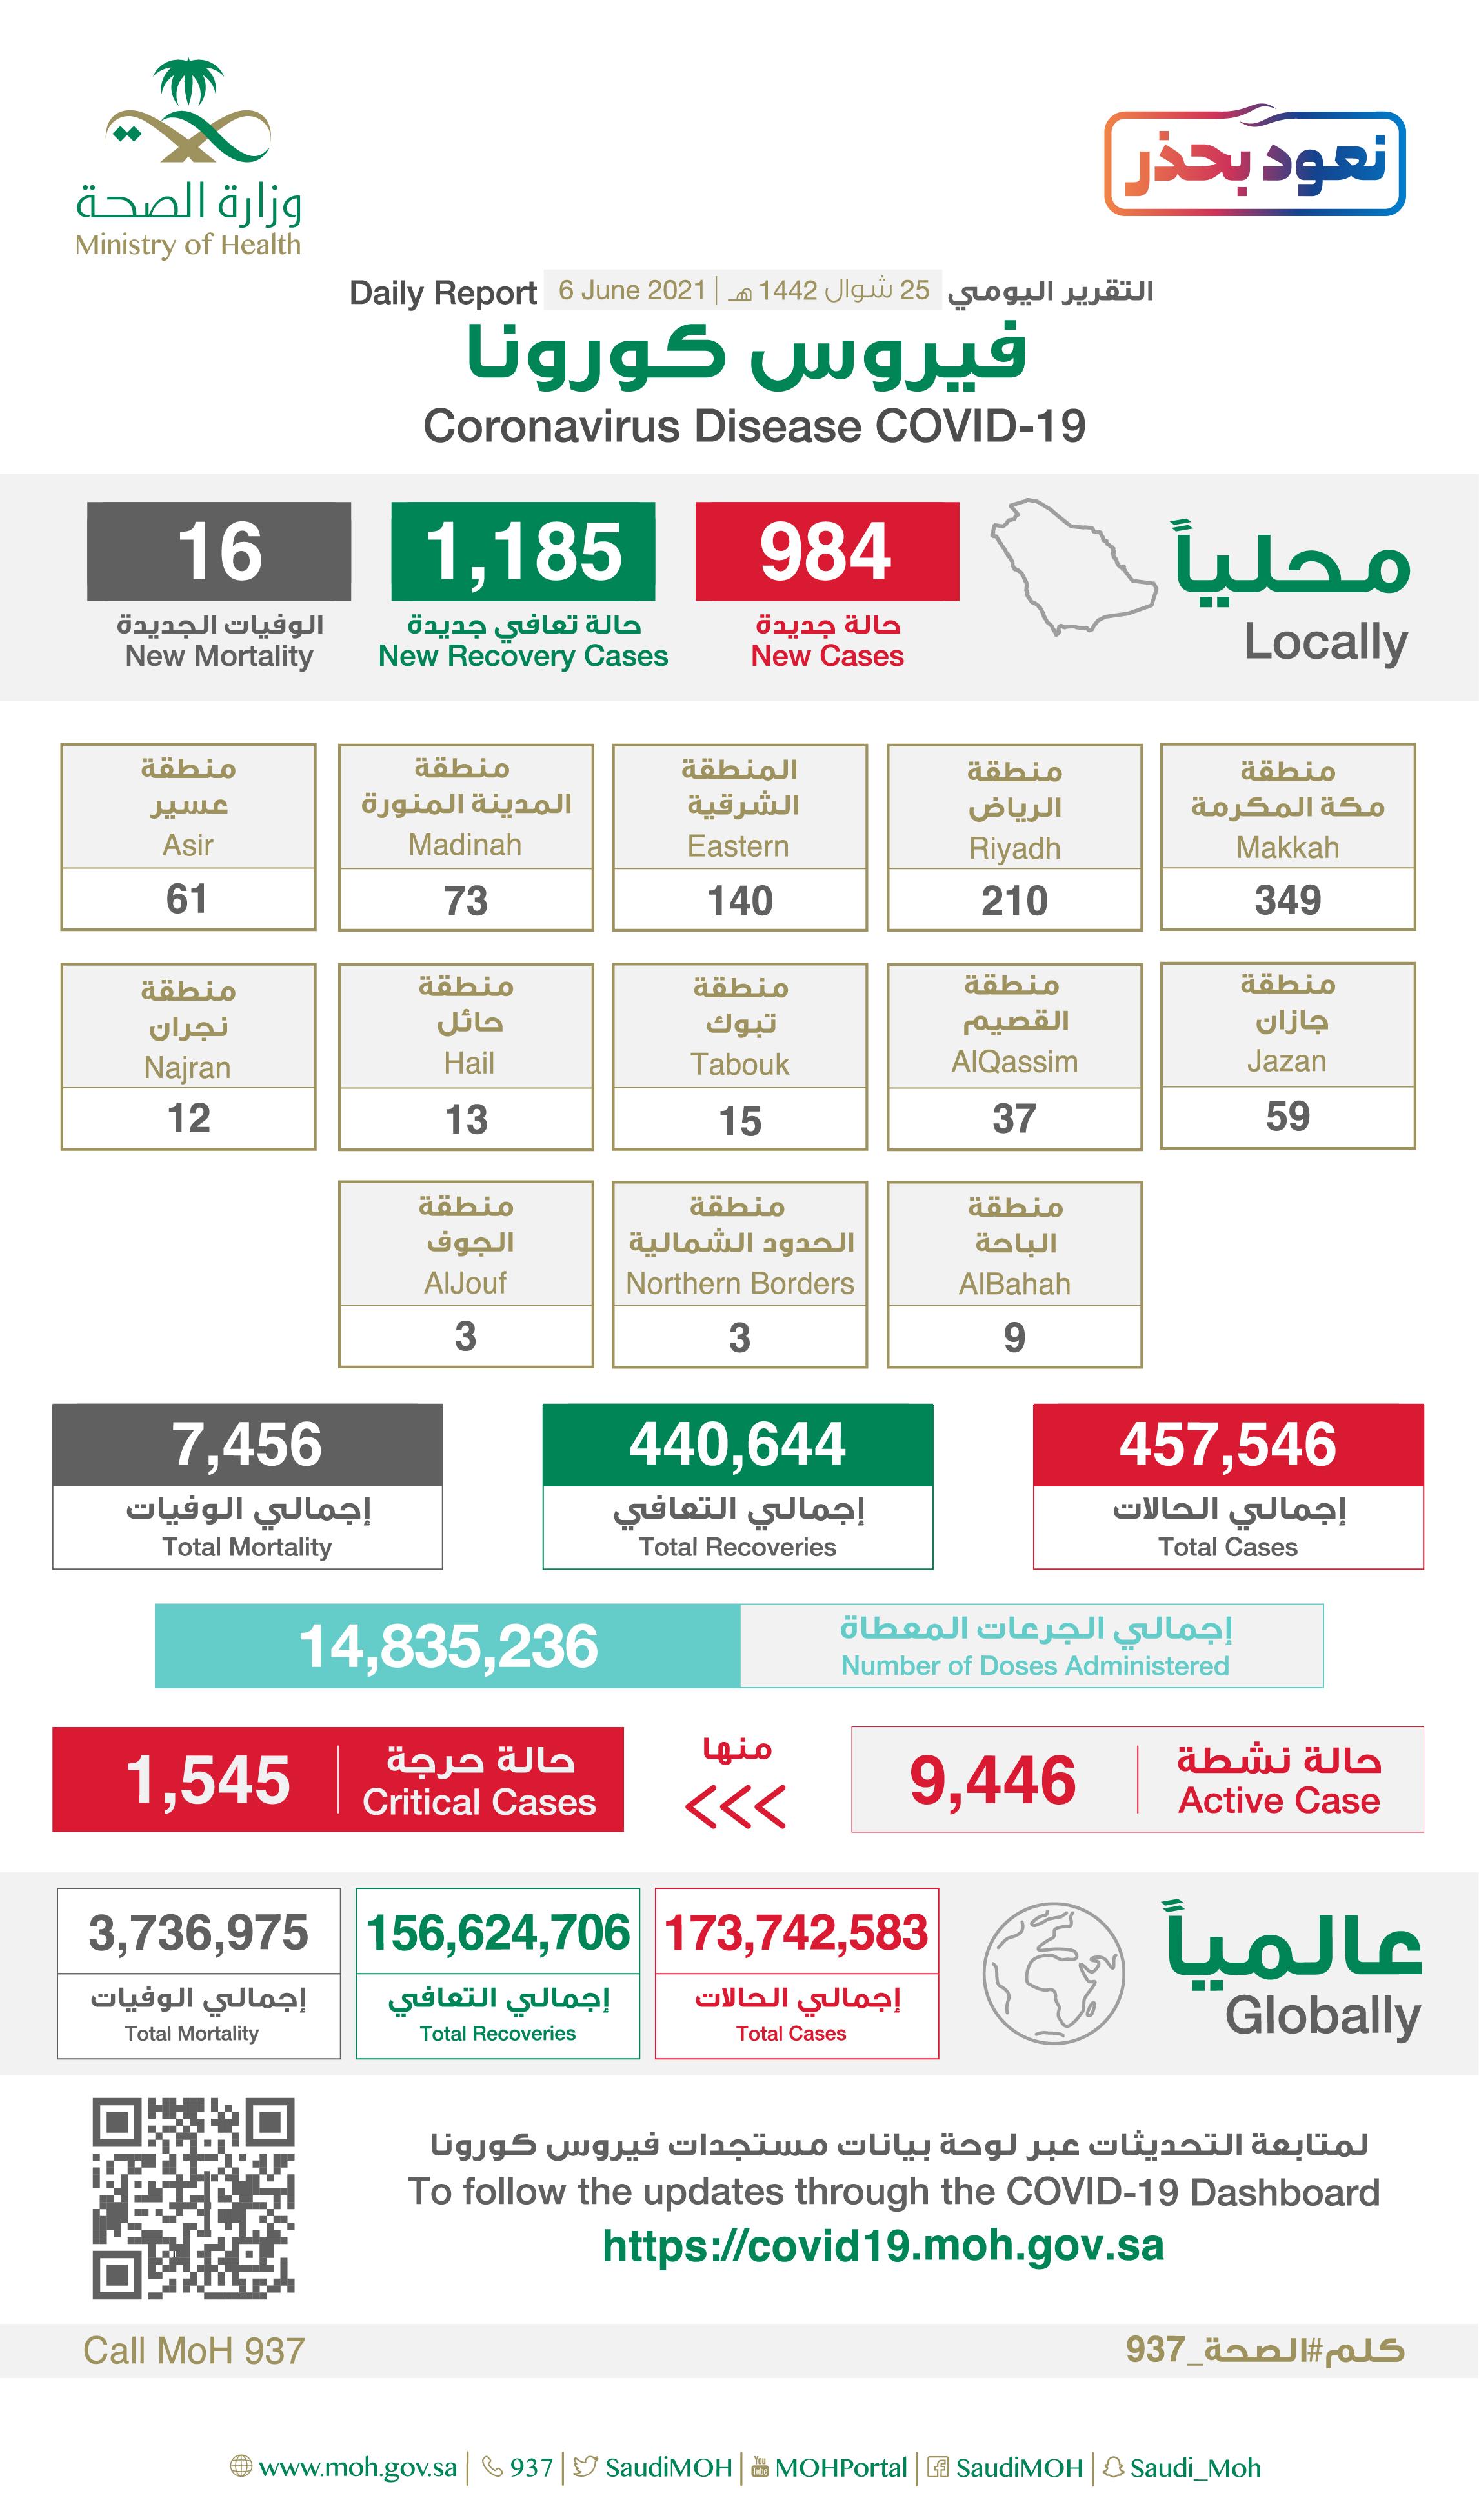 Saudi Arabia Coronavirus : Total Cases :457,546 , New Cases : 984 , Cured : 440,644 , Deaths: 7,456, Active Cases : 9,446